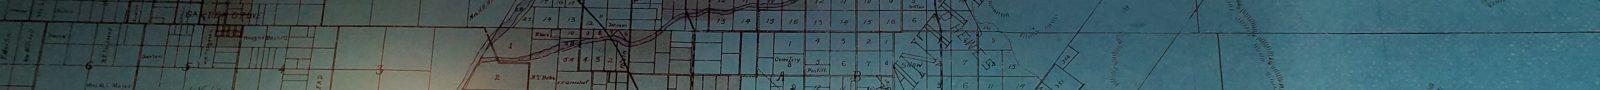 Gunwhale Taproom City of Orange